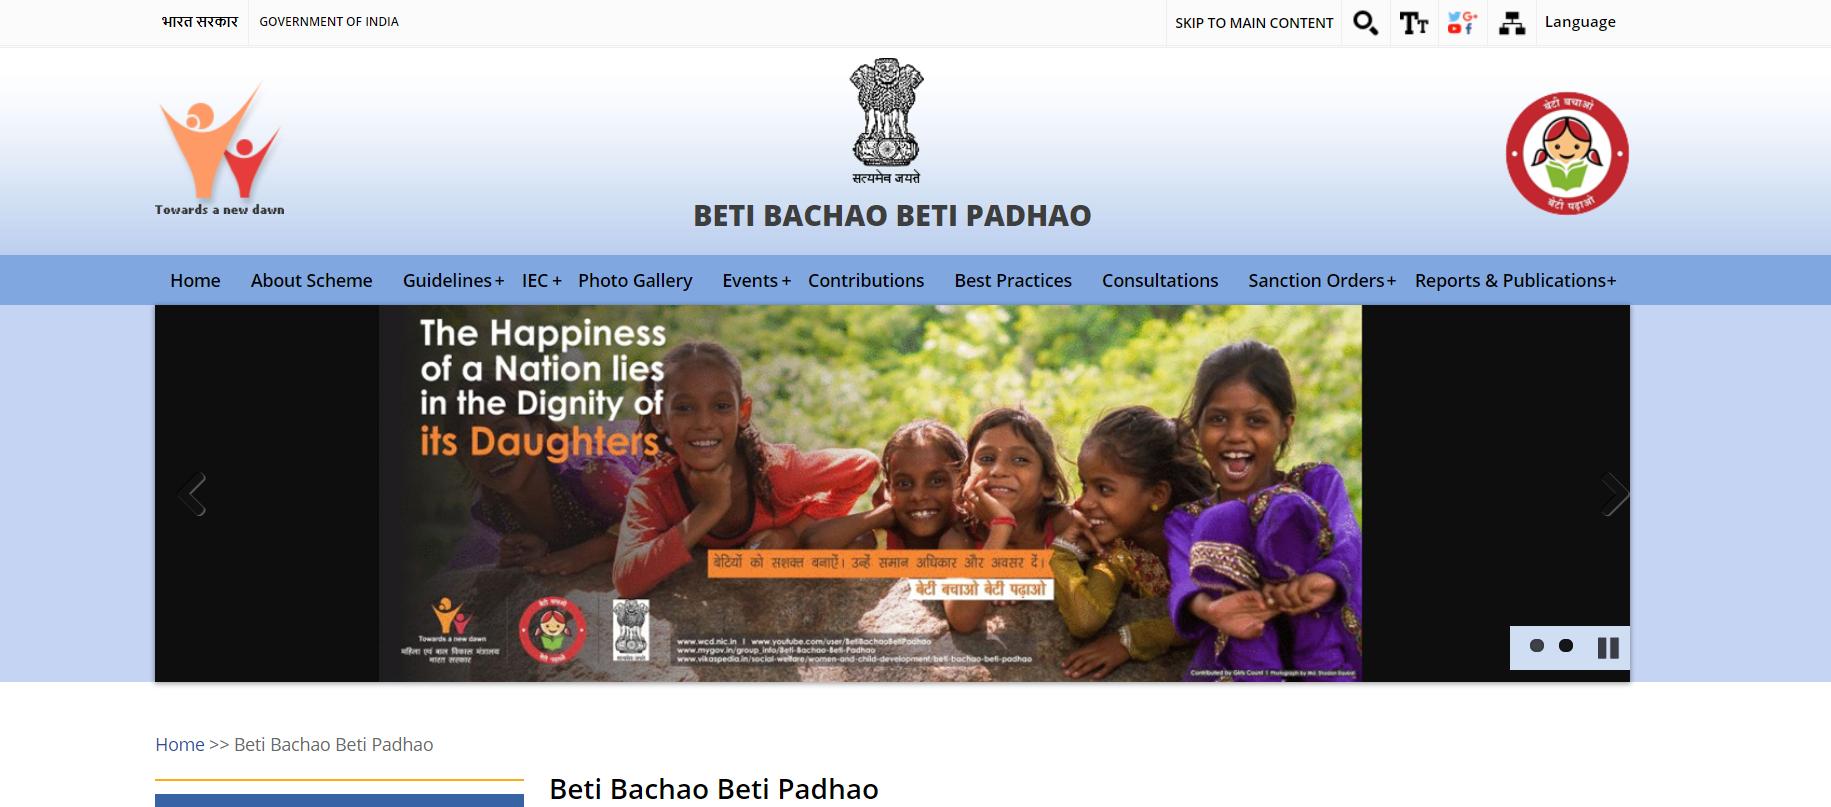 beti-bachao-beti-padhao-site